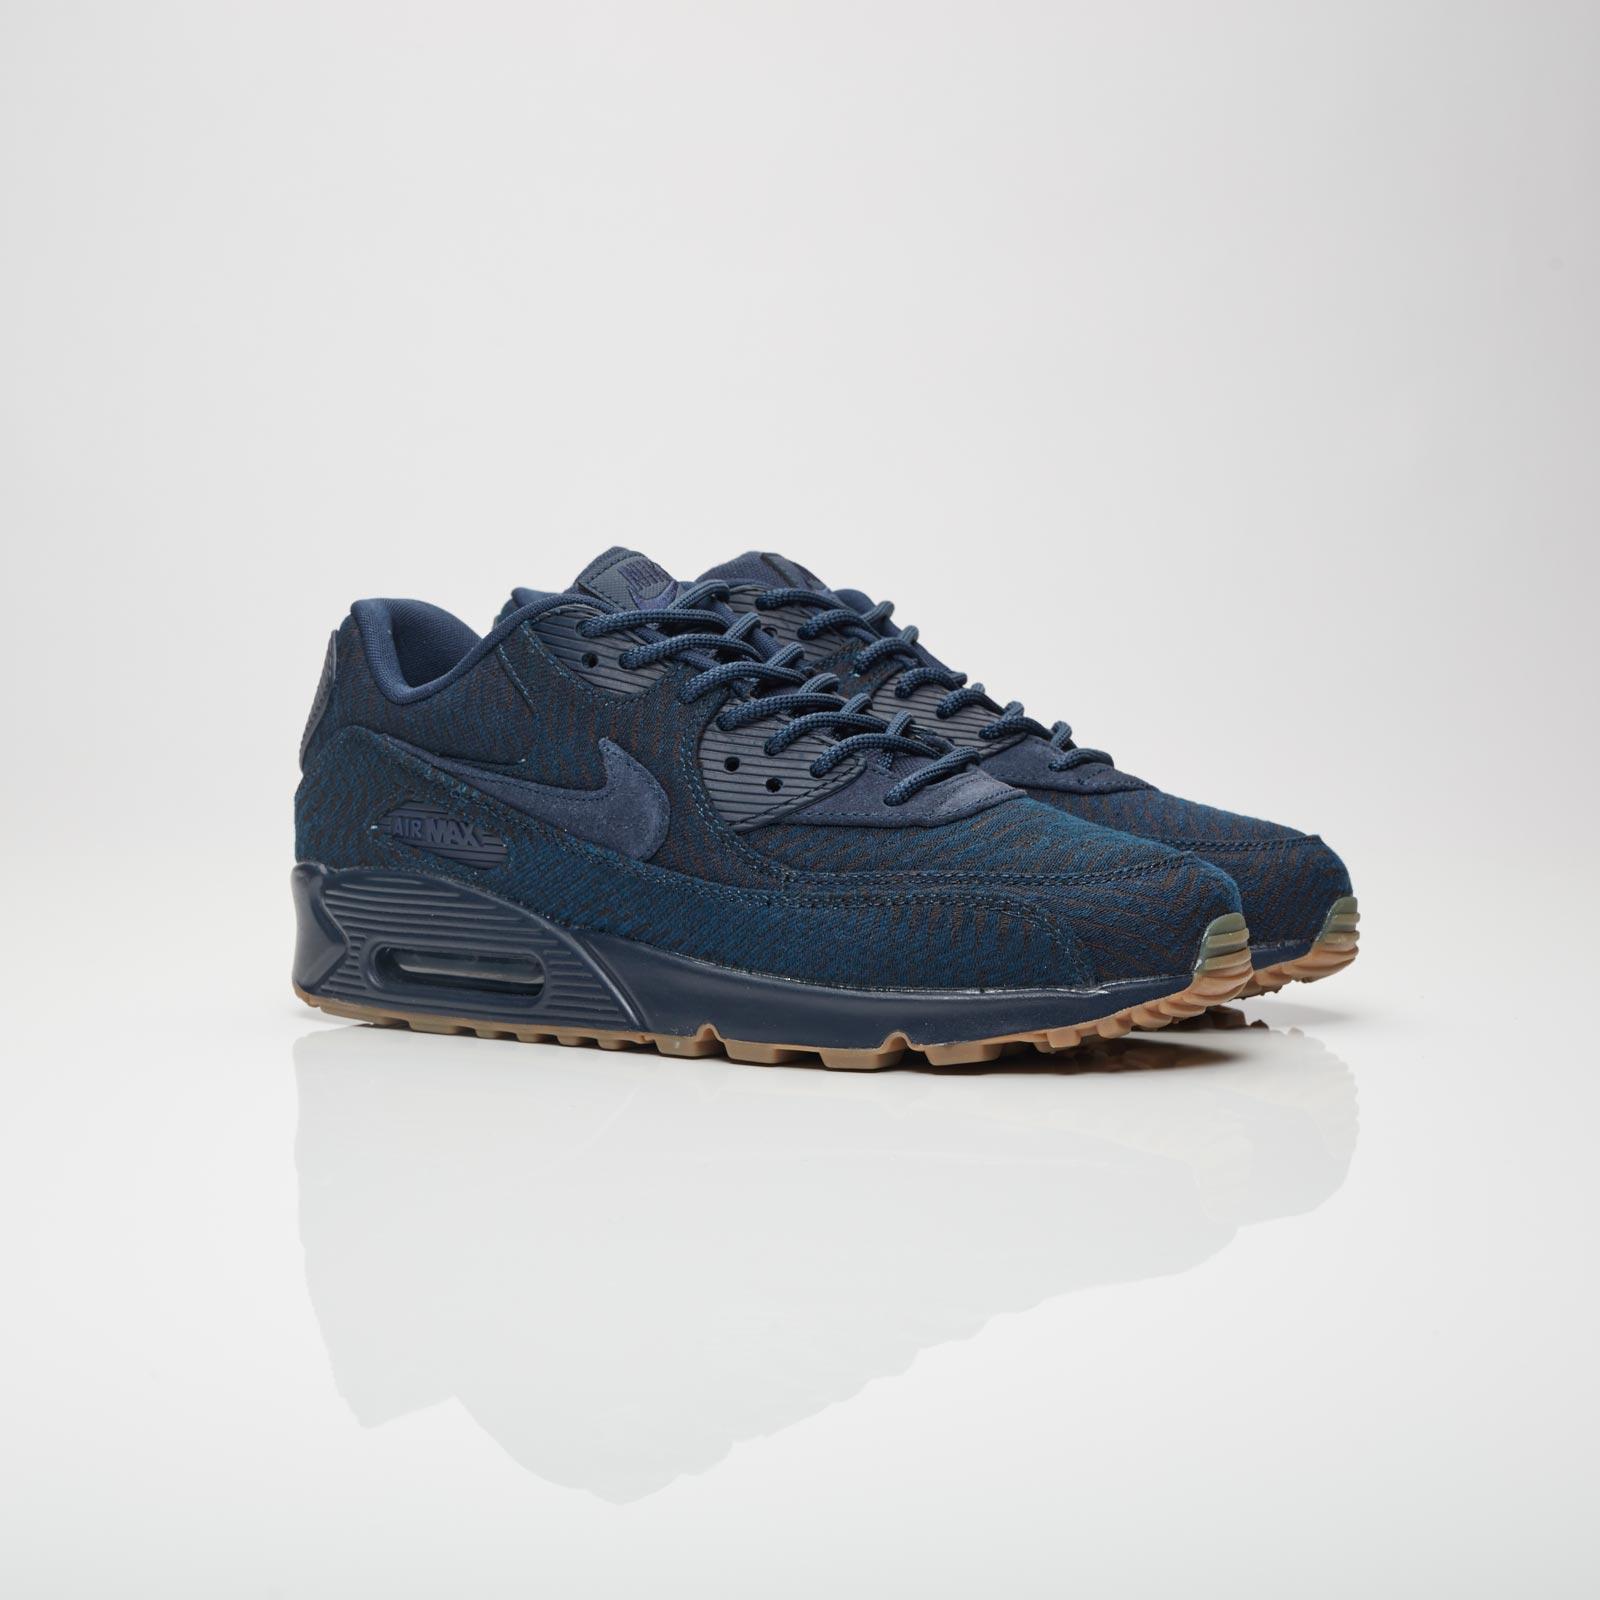 Nike Air Max 90 Premium Chaussuressnstuff Jcrd 918358 400 Chaussuressnstuff Premium fee624